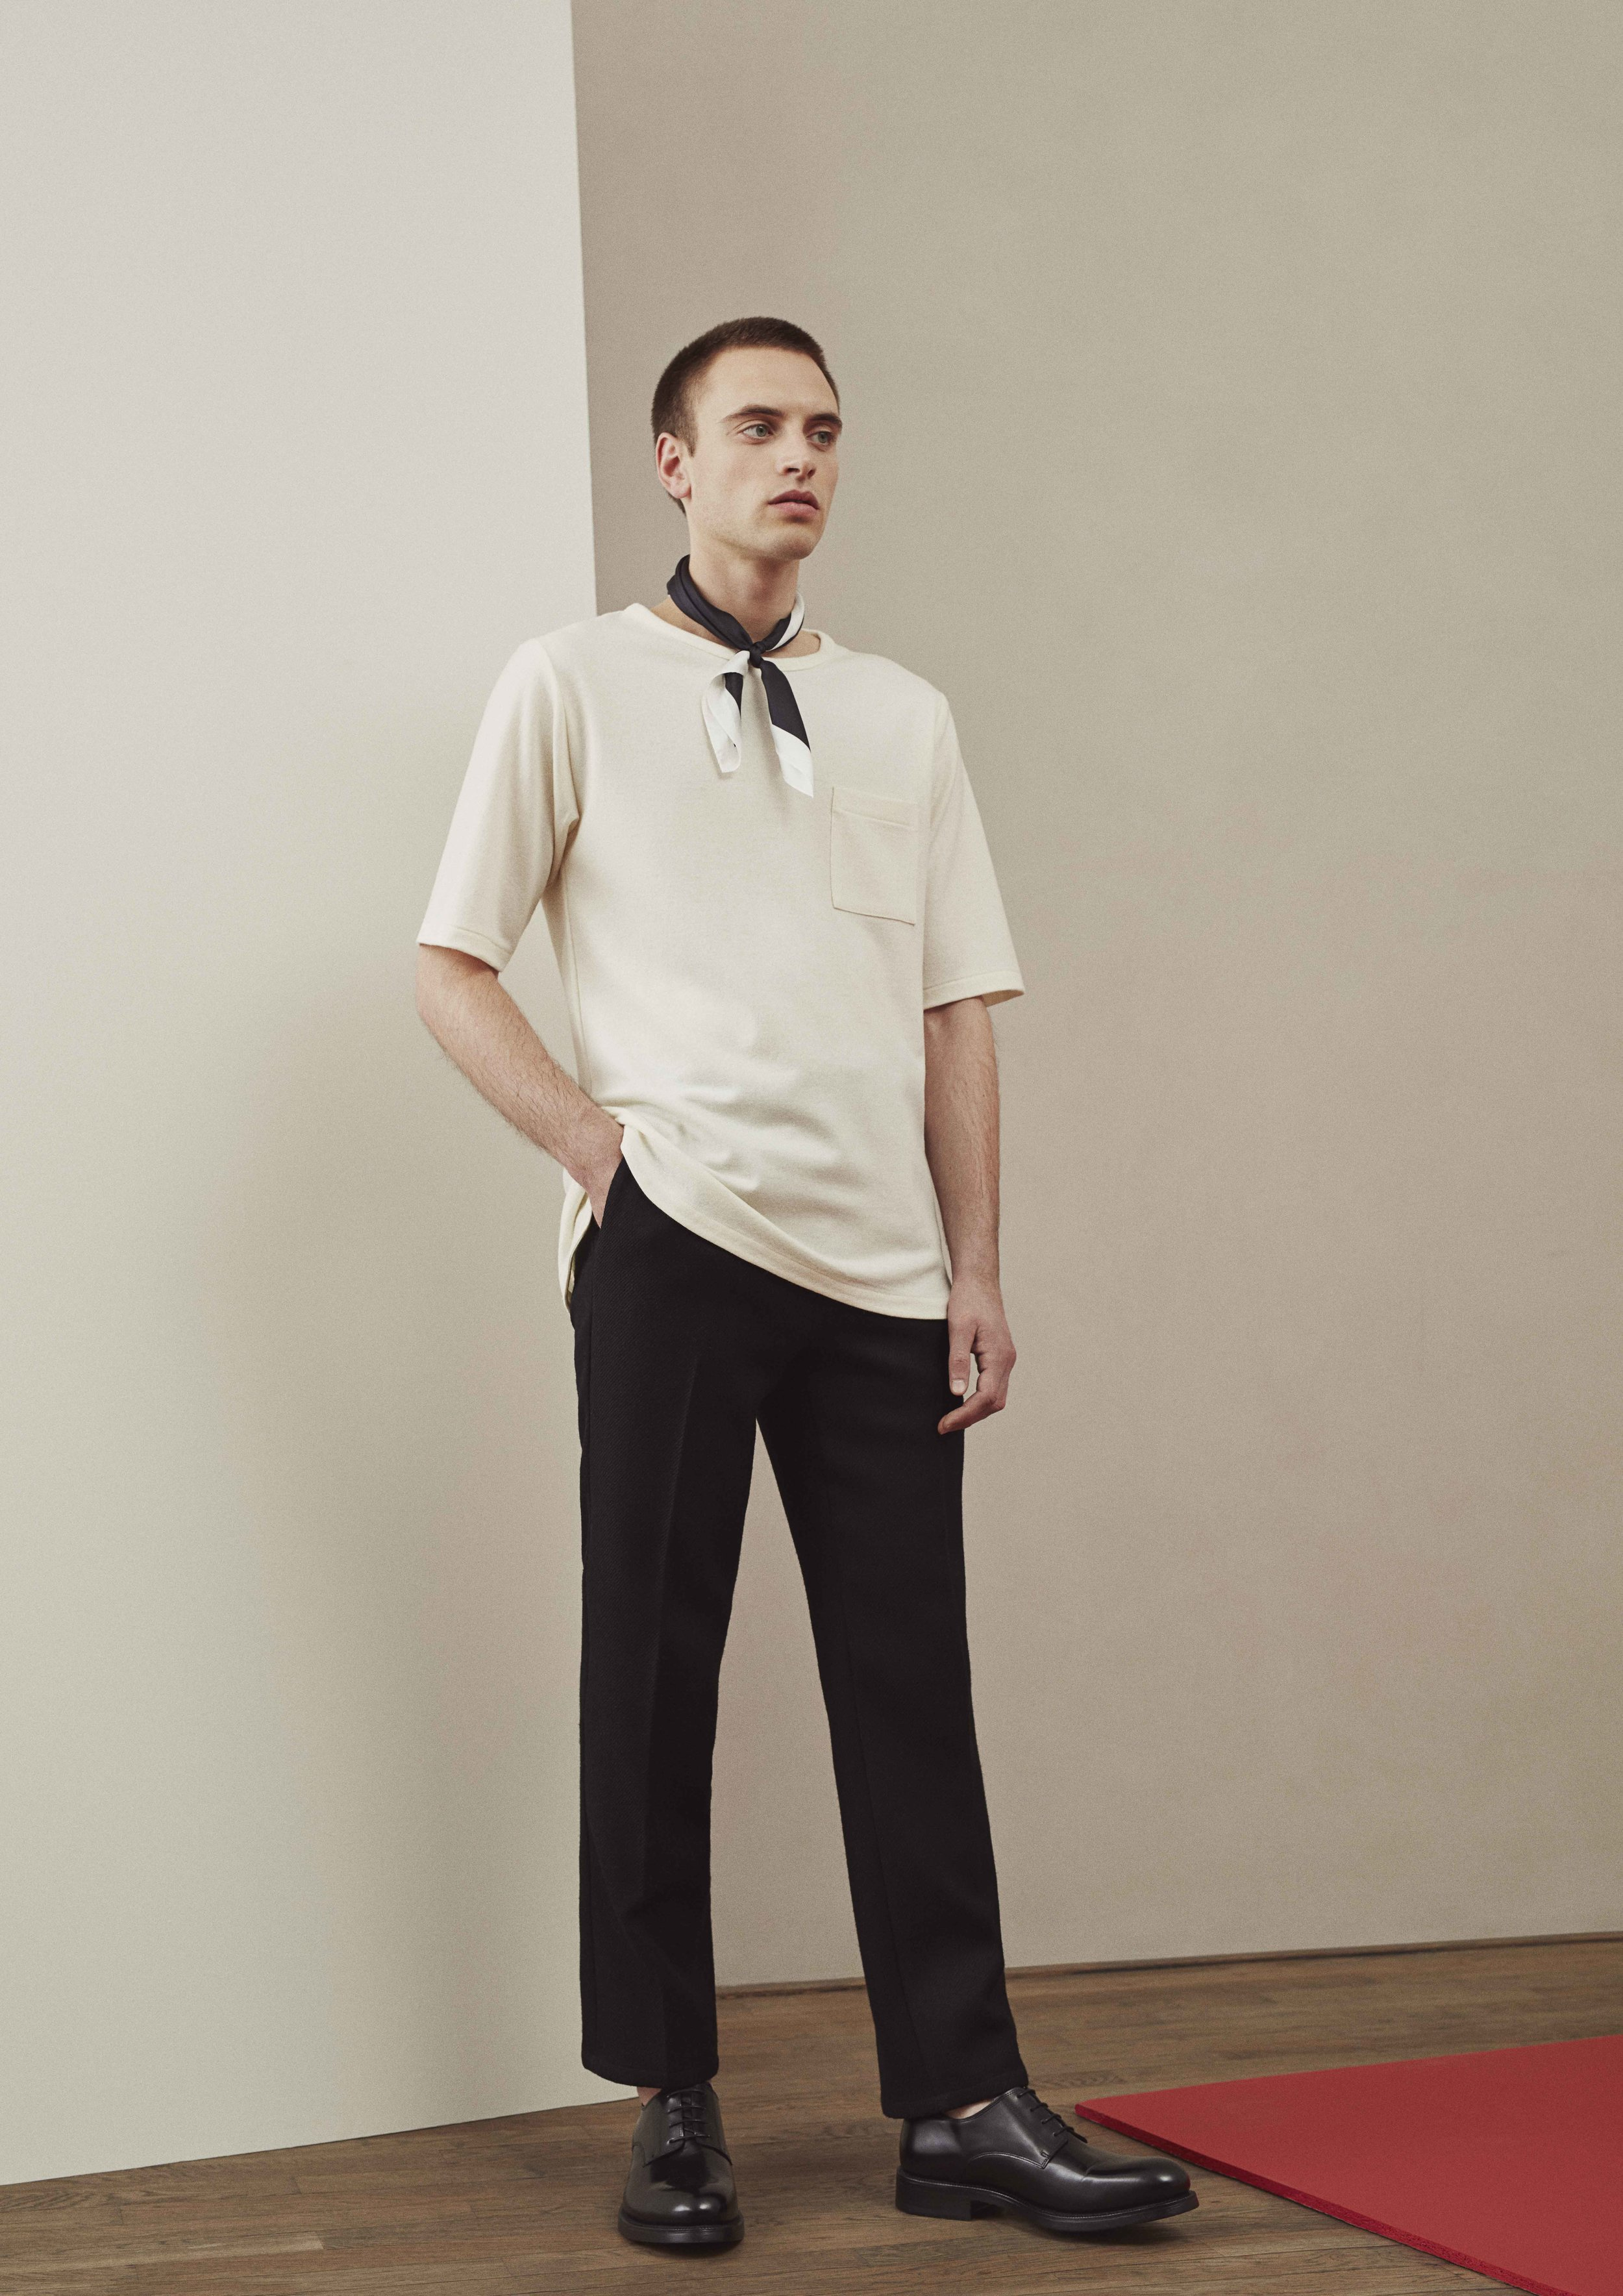 <b>6</b><br>Louis Wool Jersey Top<br>Felix Highland Wool Pants